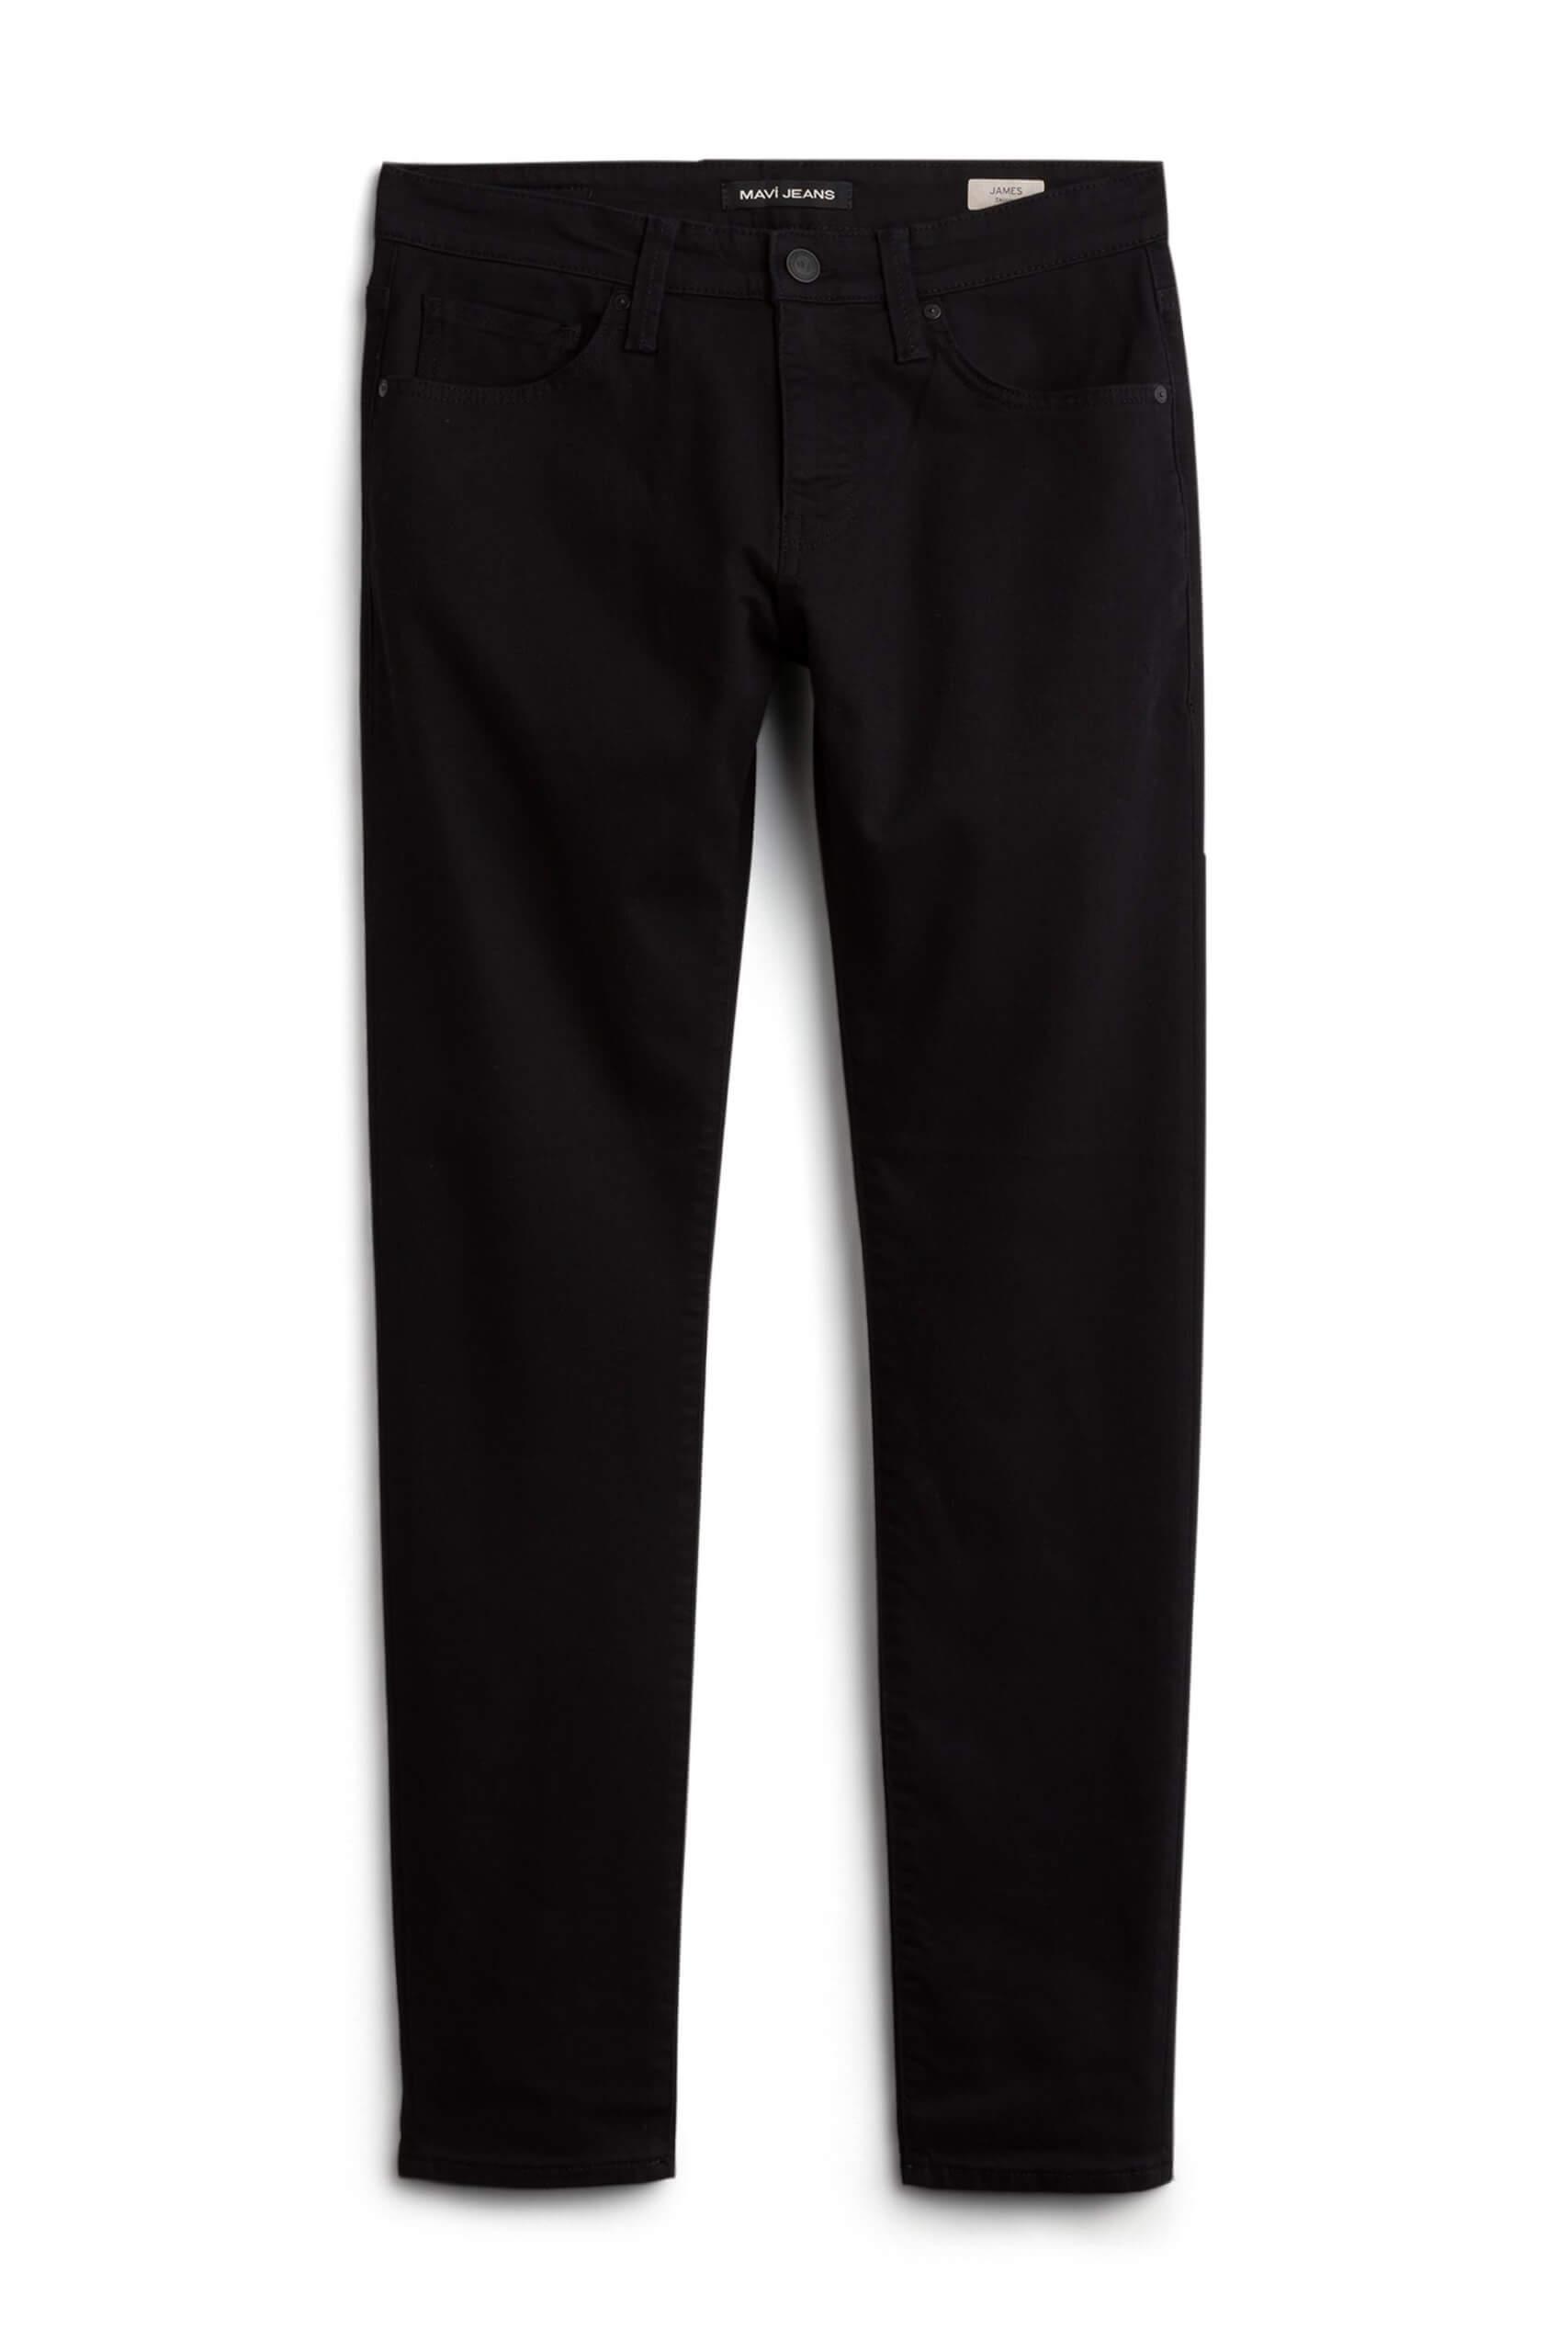 Stitch Fix Men's dark wash skinny jeans.